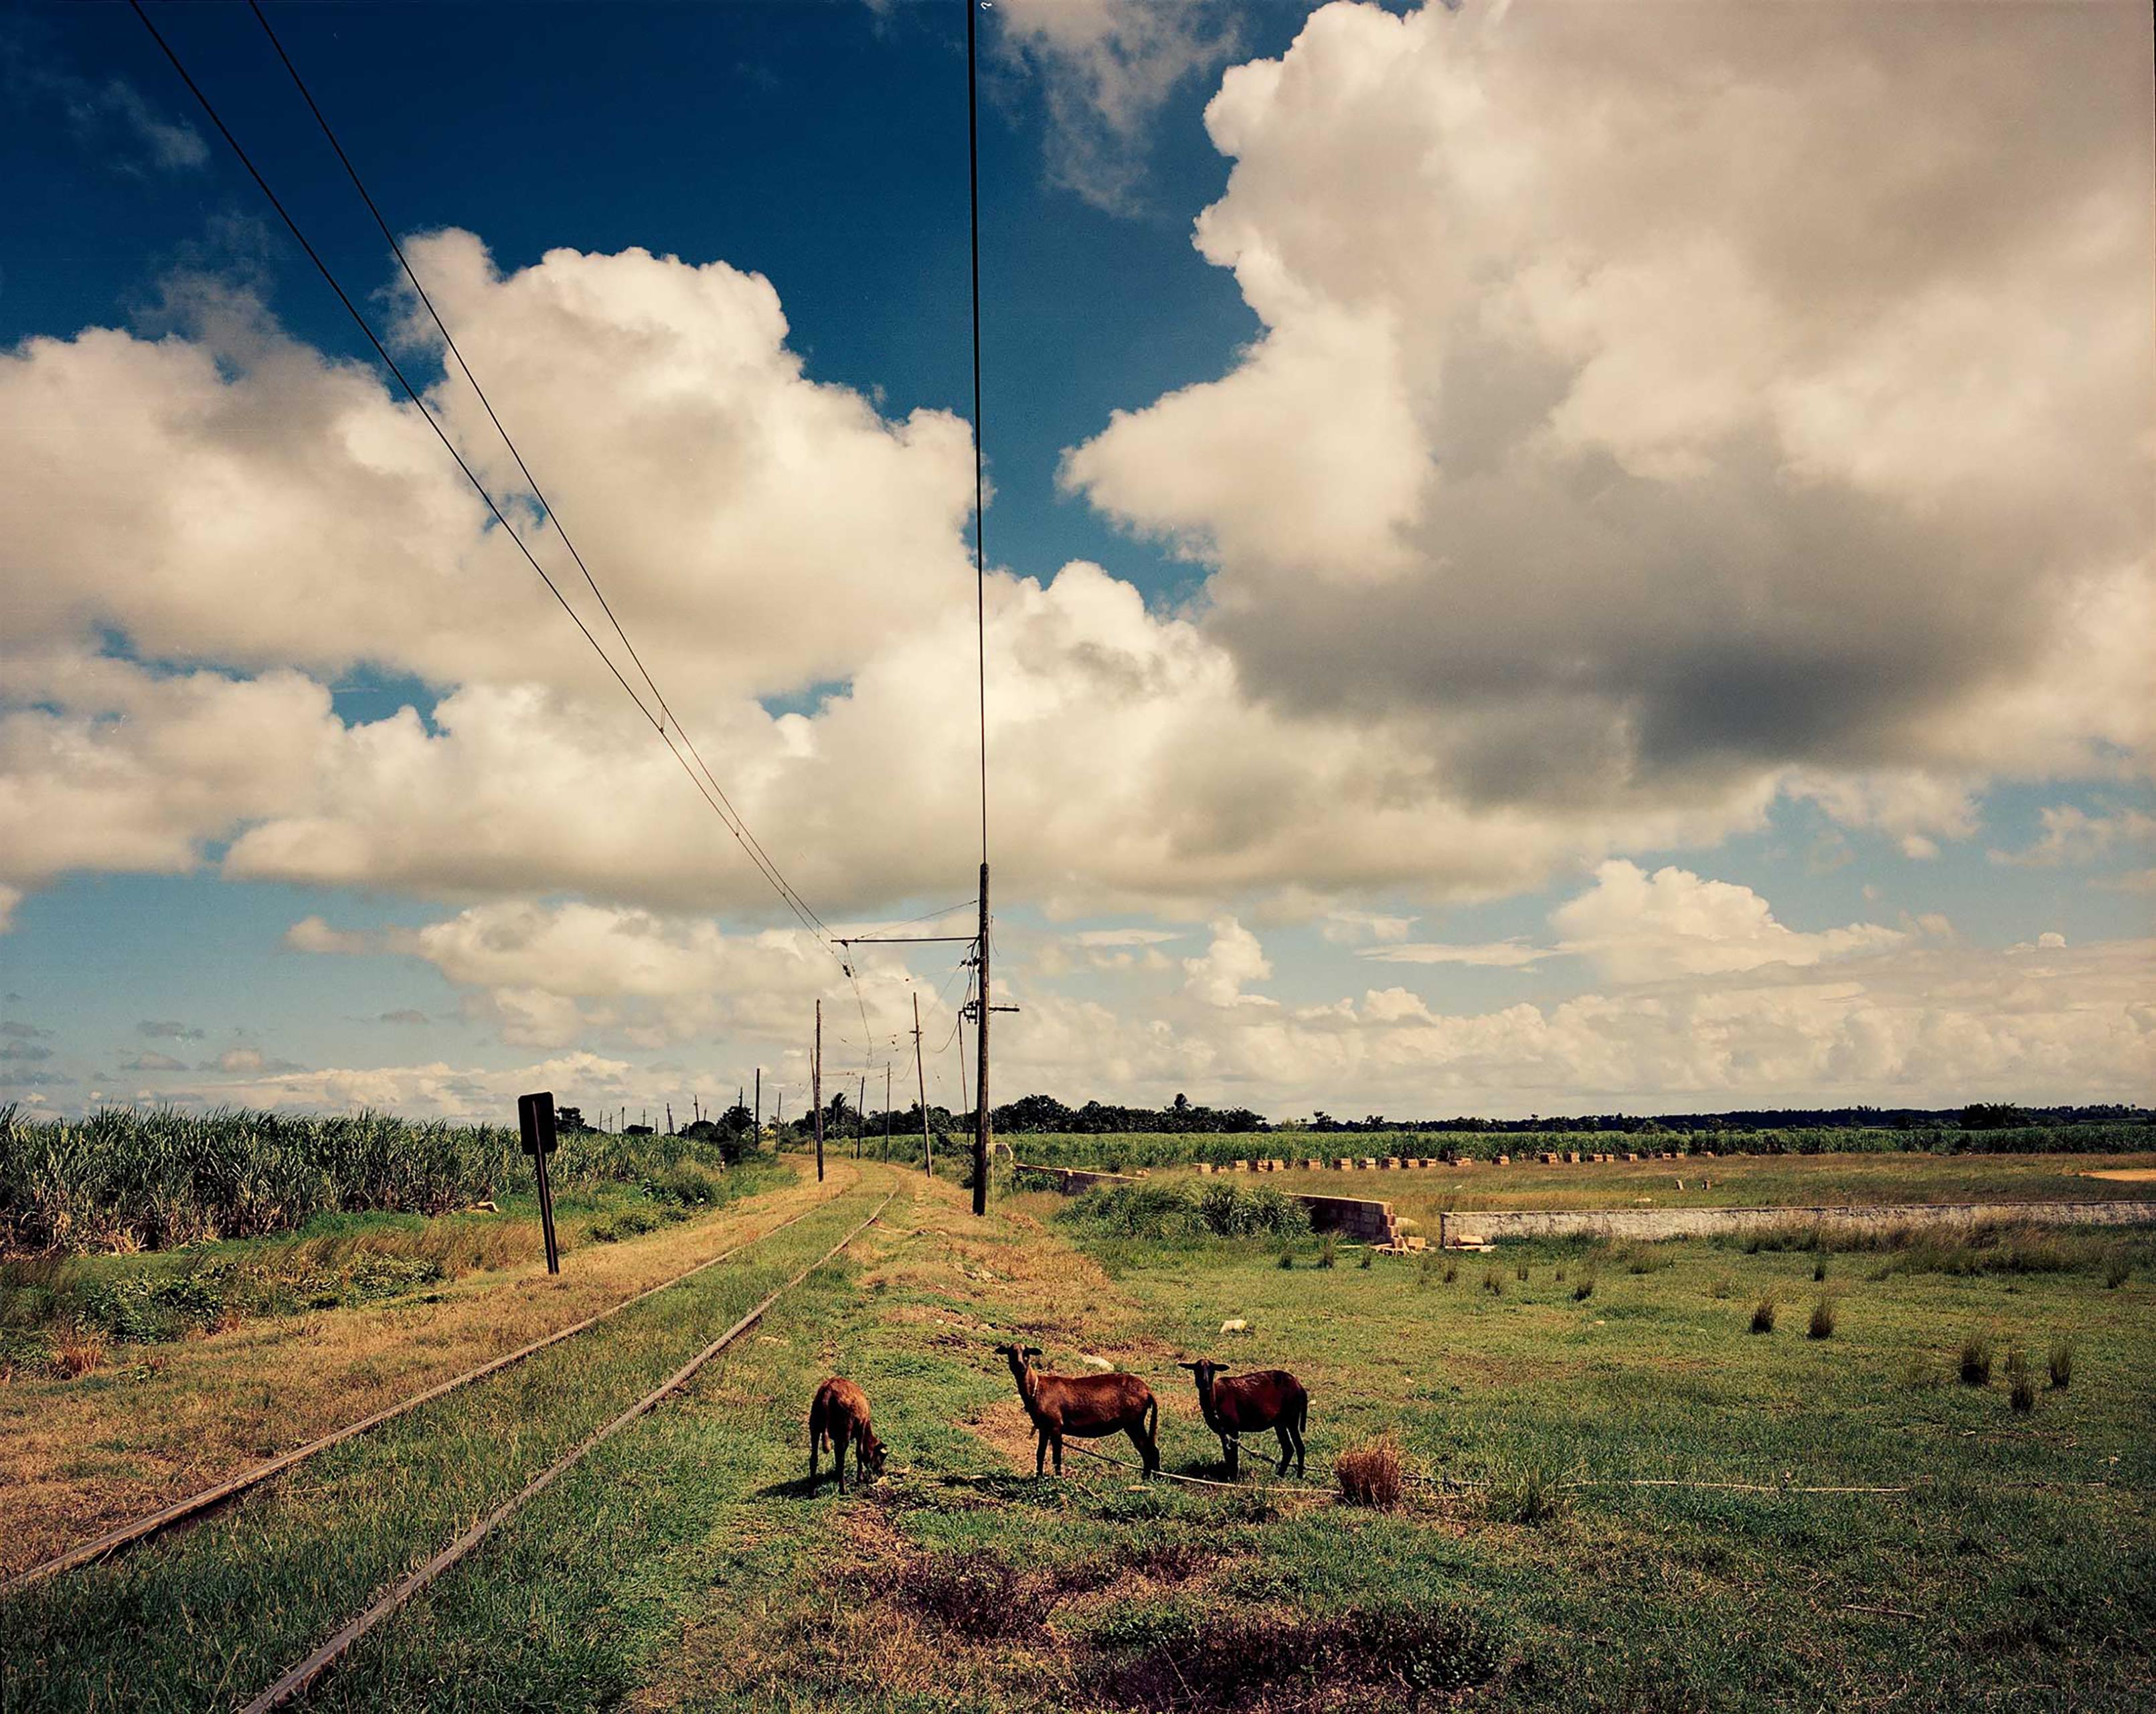 Lambs grazing near the Hershey electric train railway in Cuba.